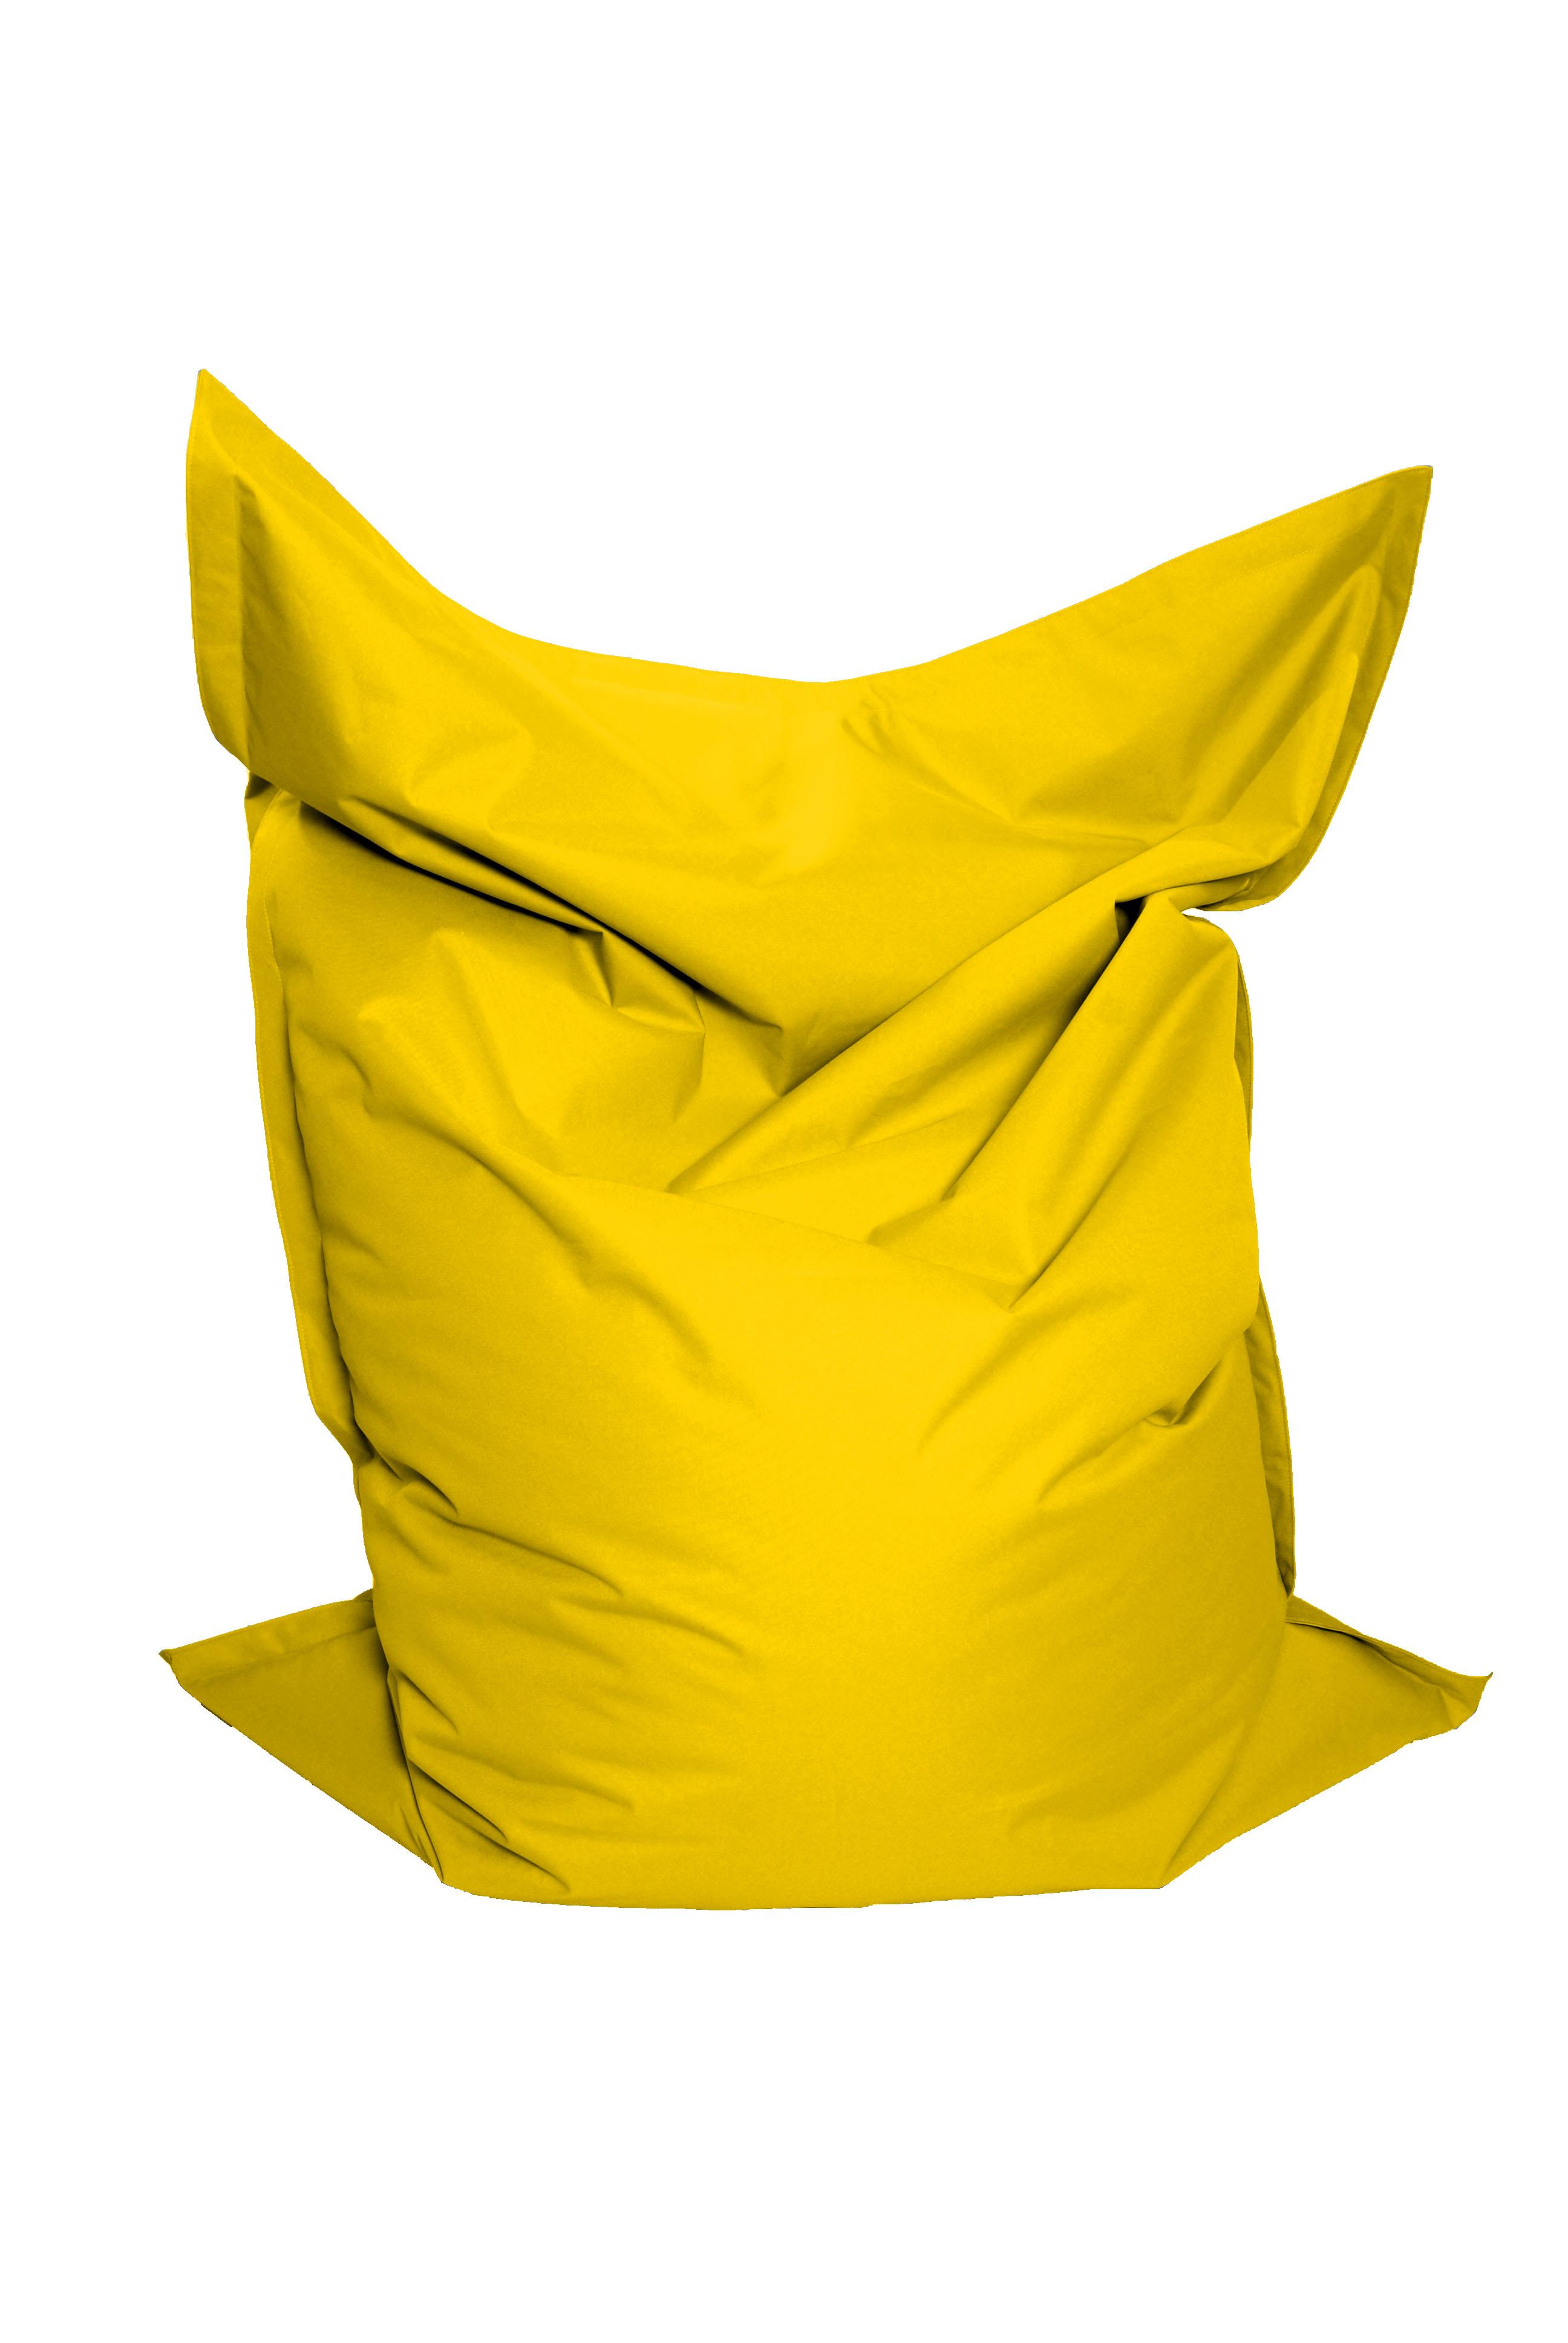 M&M sedací vak Standard 141X180cm žlutá (žlutá 60103)